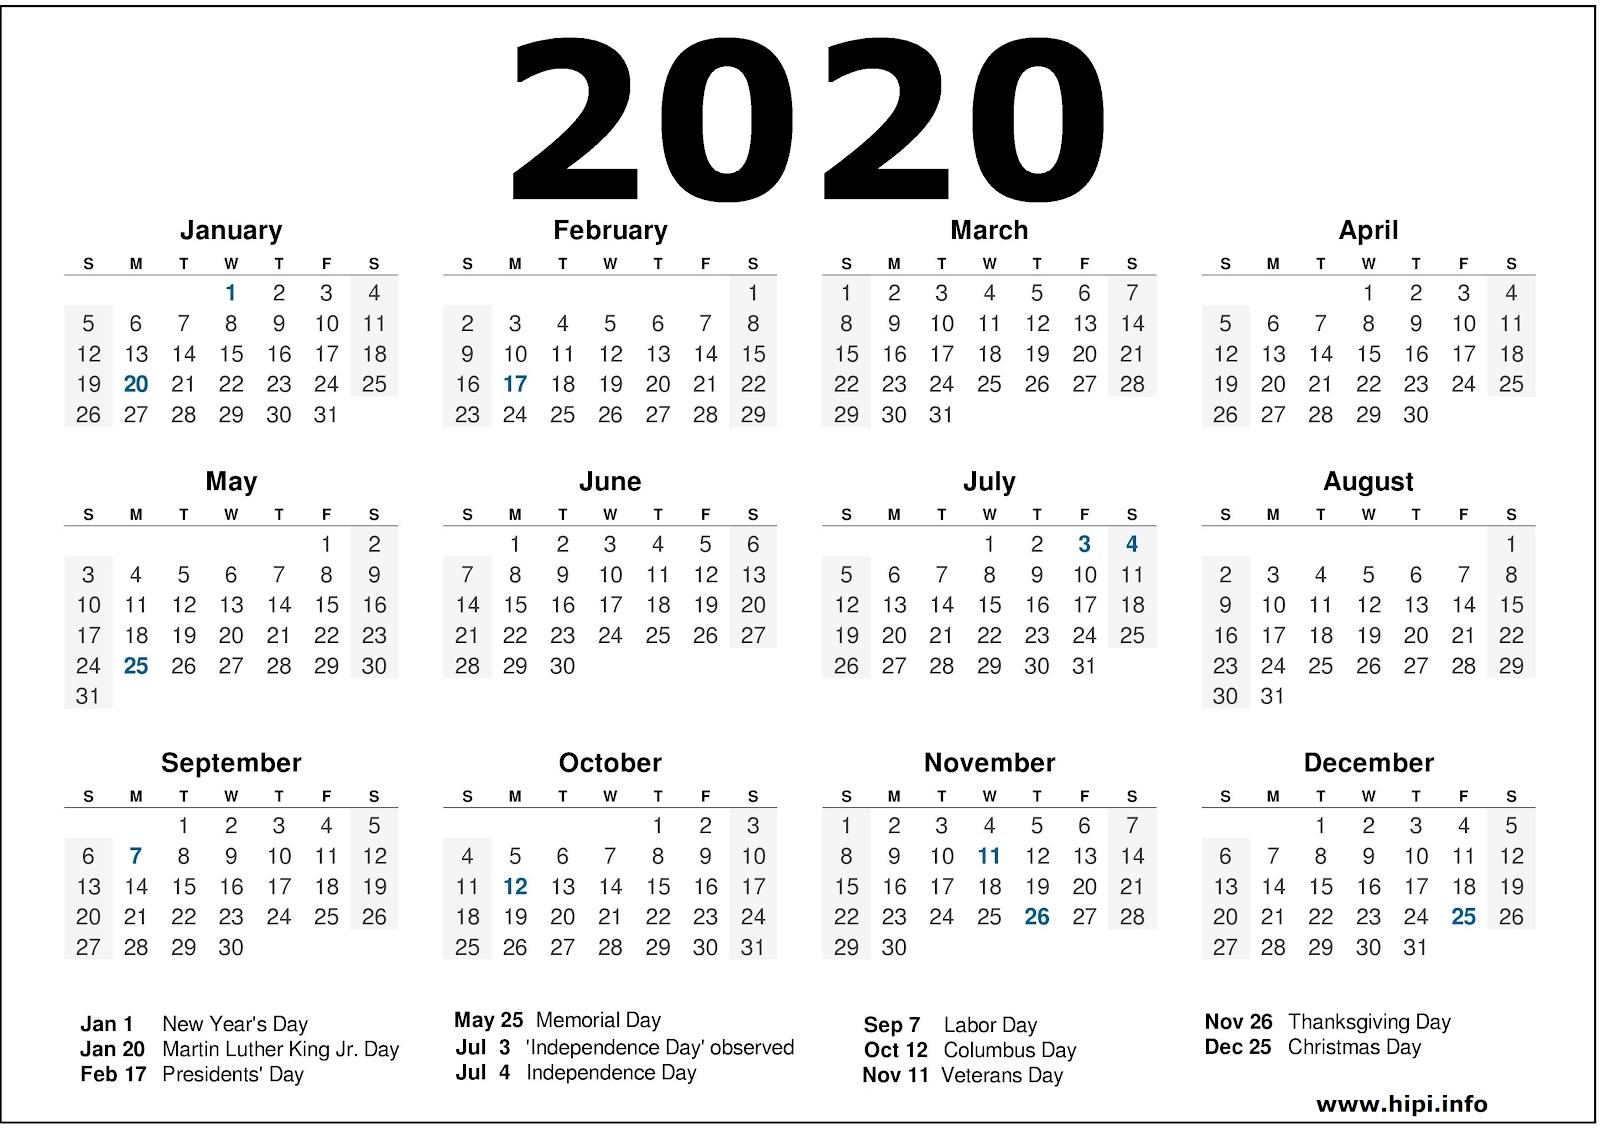 2020 Calendar Printable With Holidays - 2020 Calendar